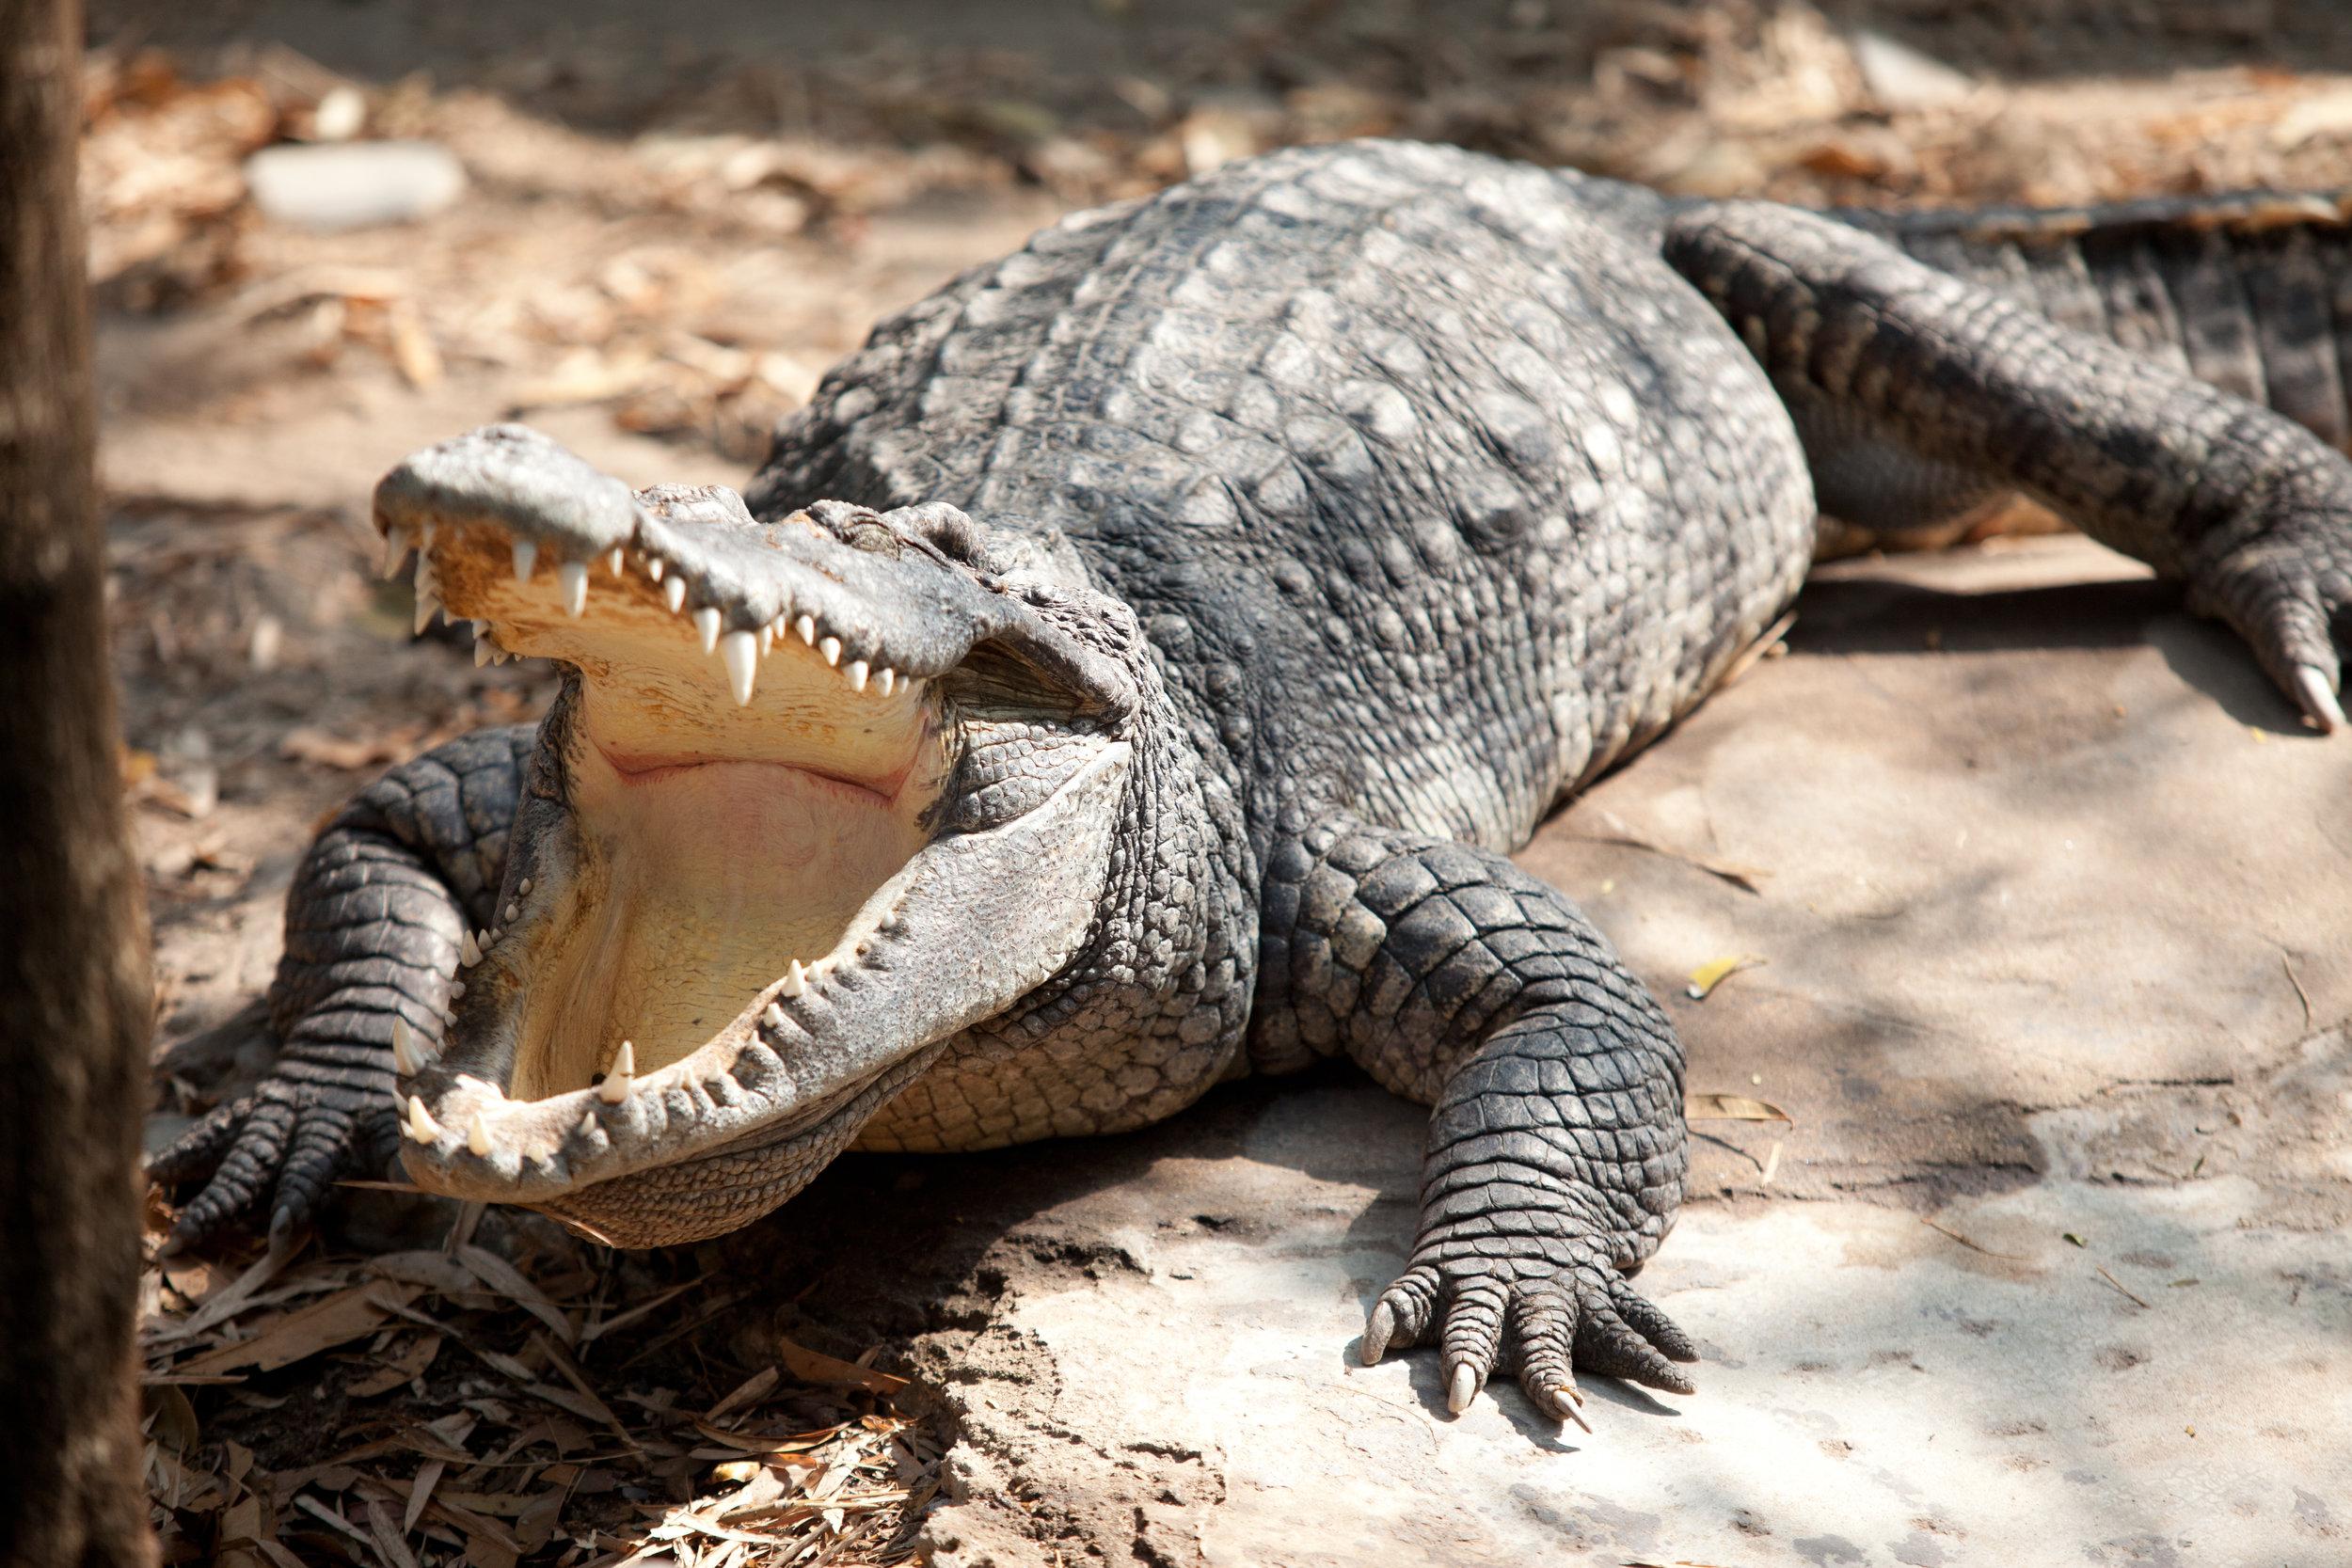 Closeup eye of a saltwater crocodile